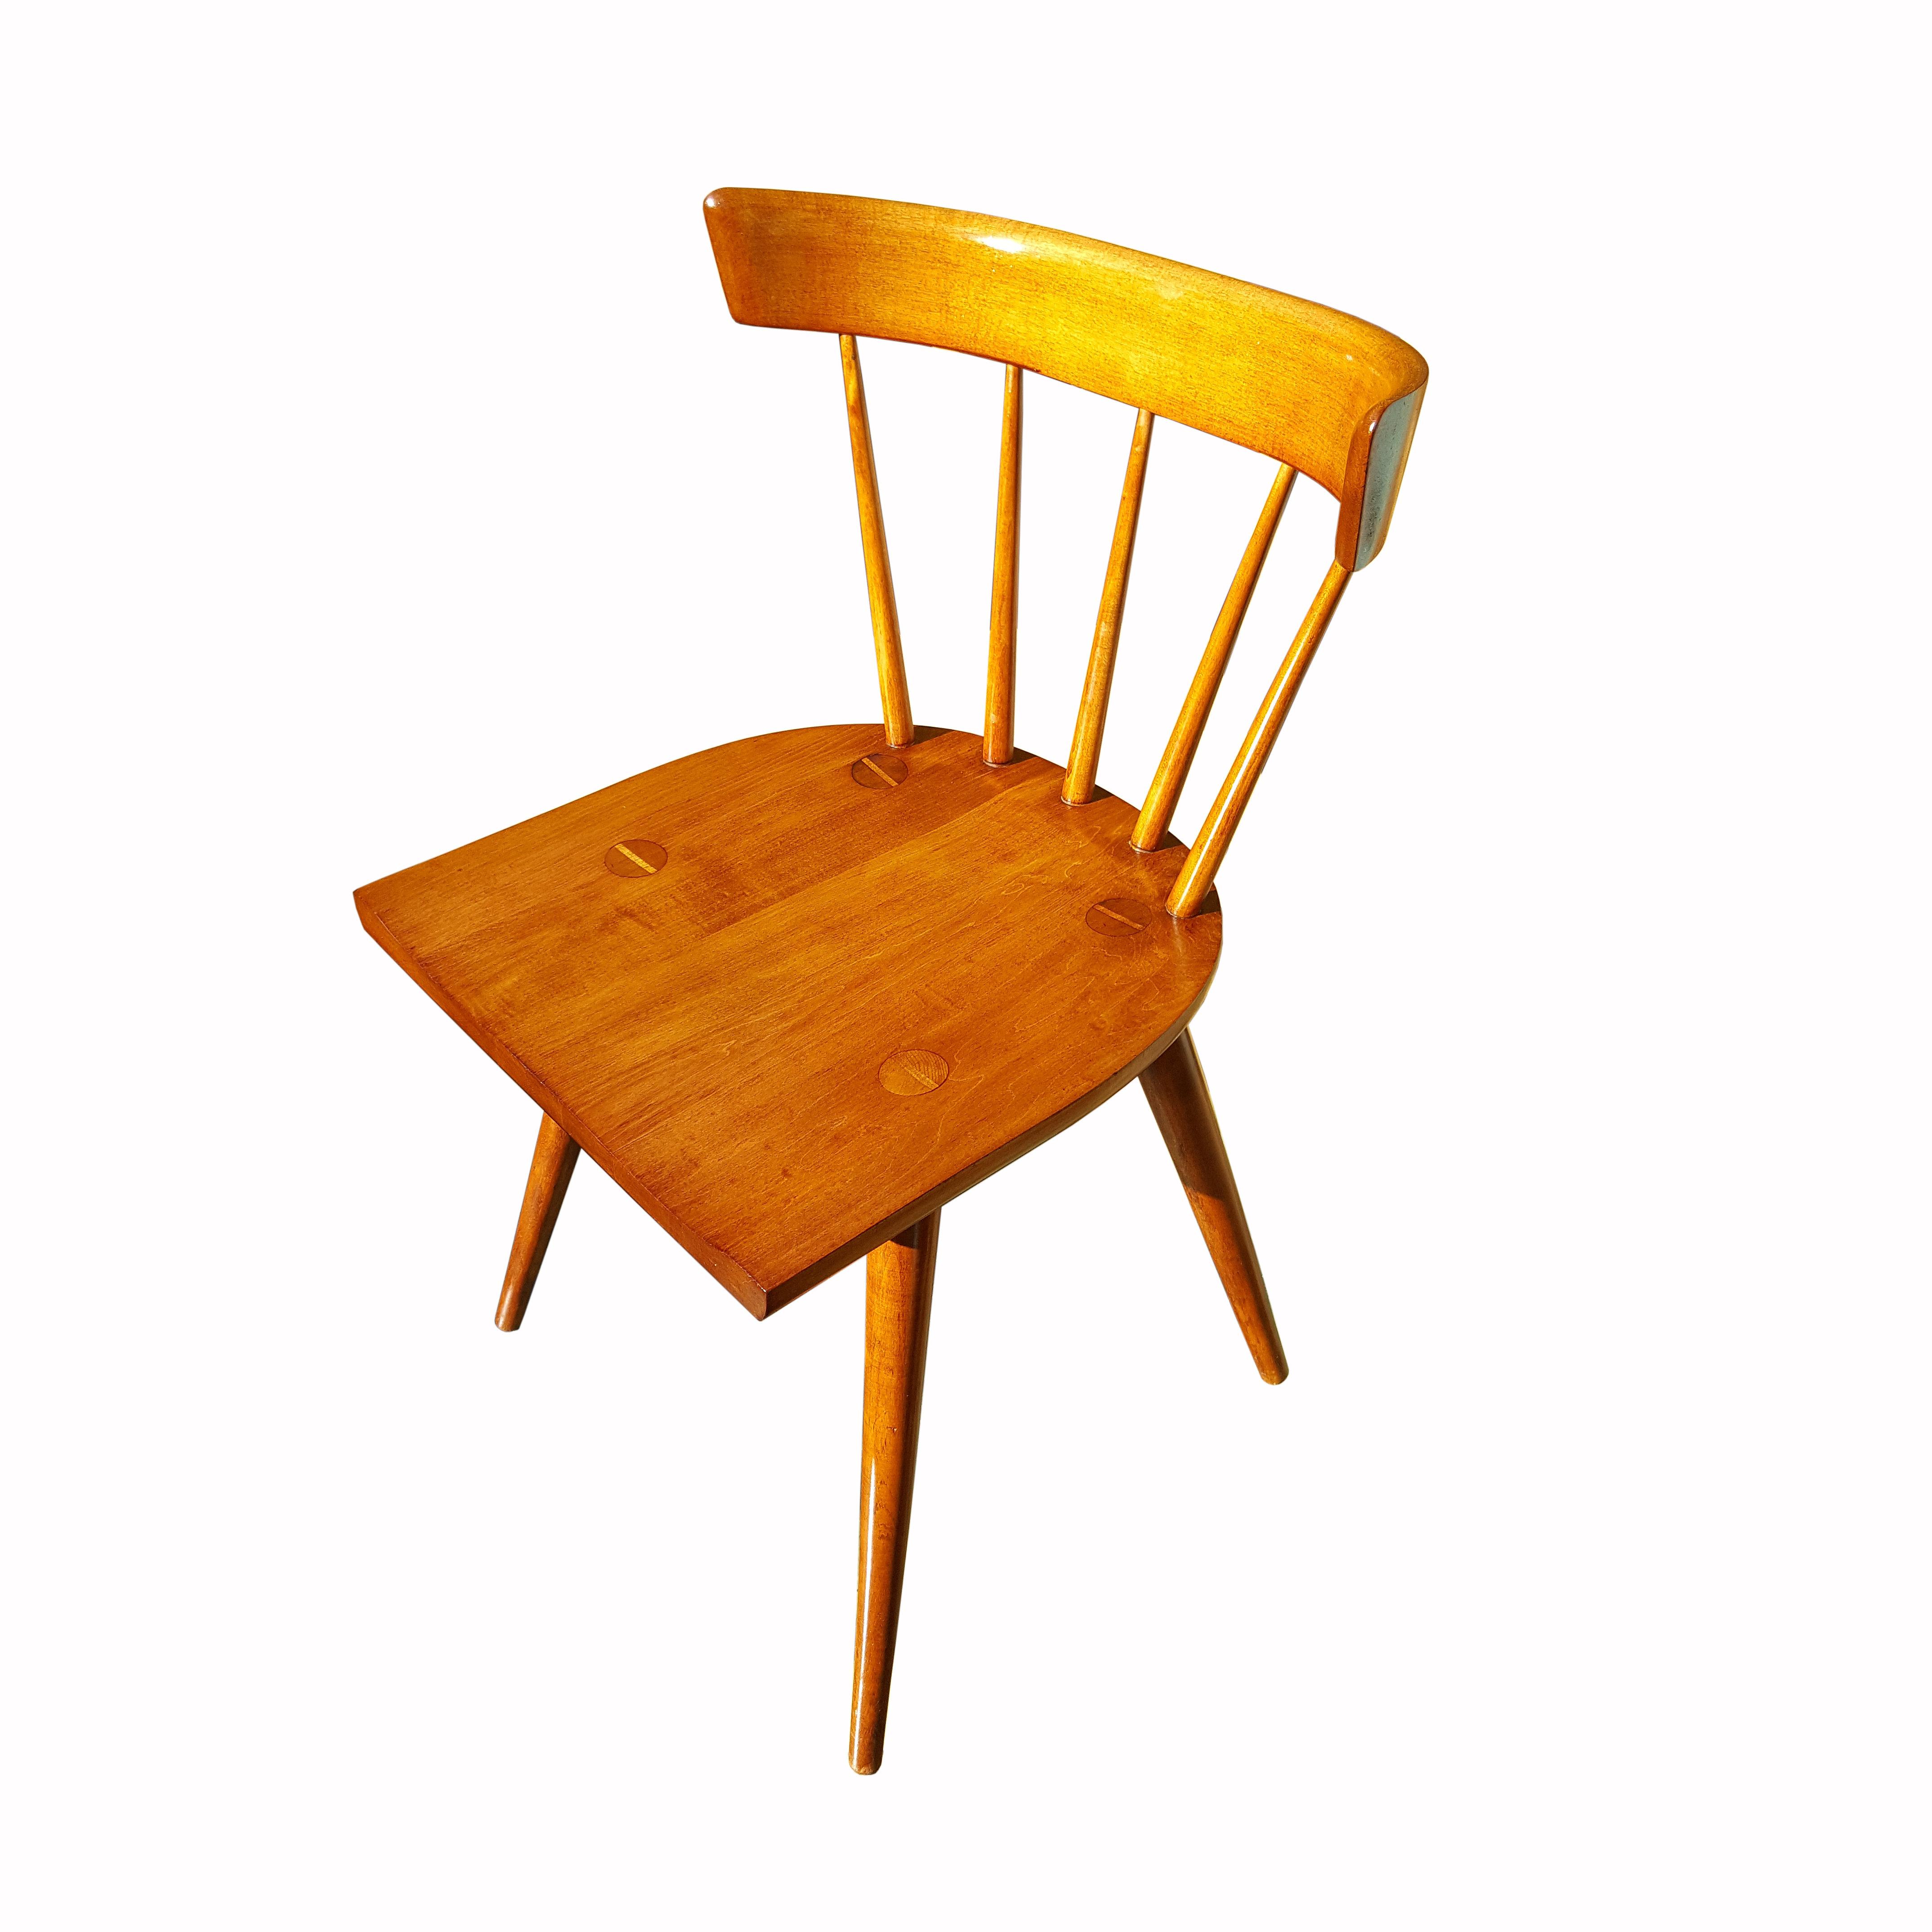 bagatelle gallery Mid century modern furniture Austin Tx